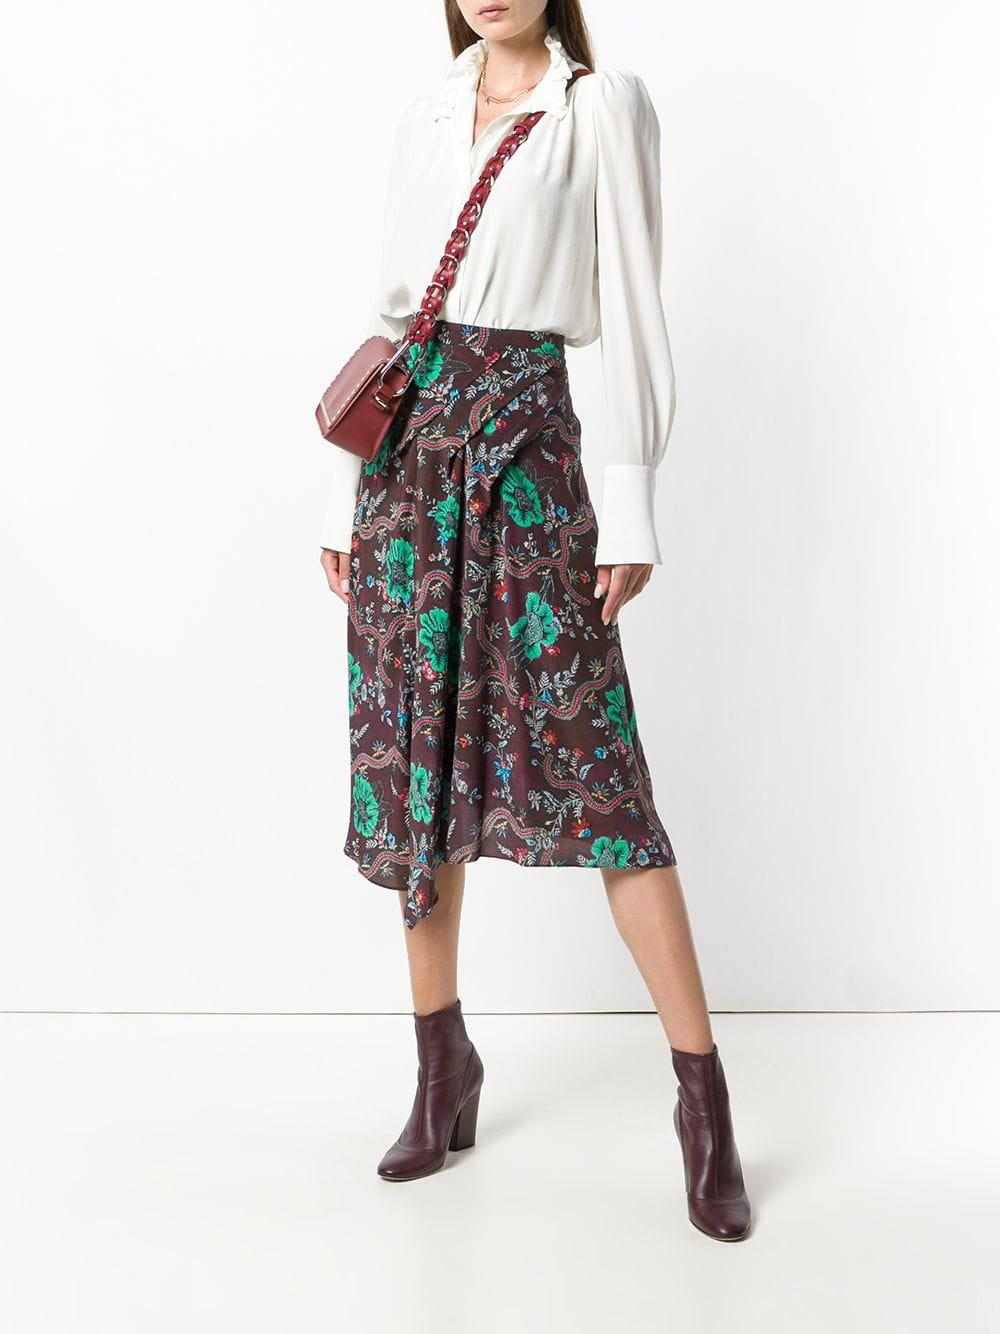 c4c23c0d89 Isabel Marant Cacia Skirt in Red - Lyst